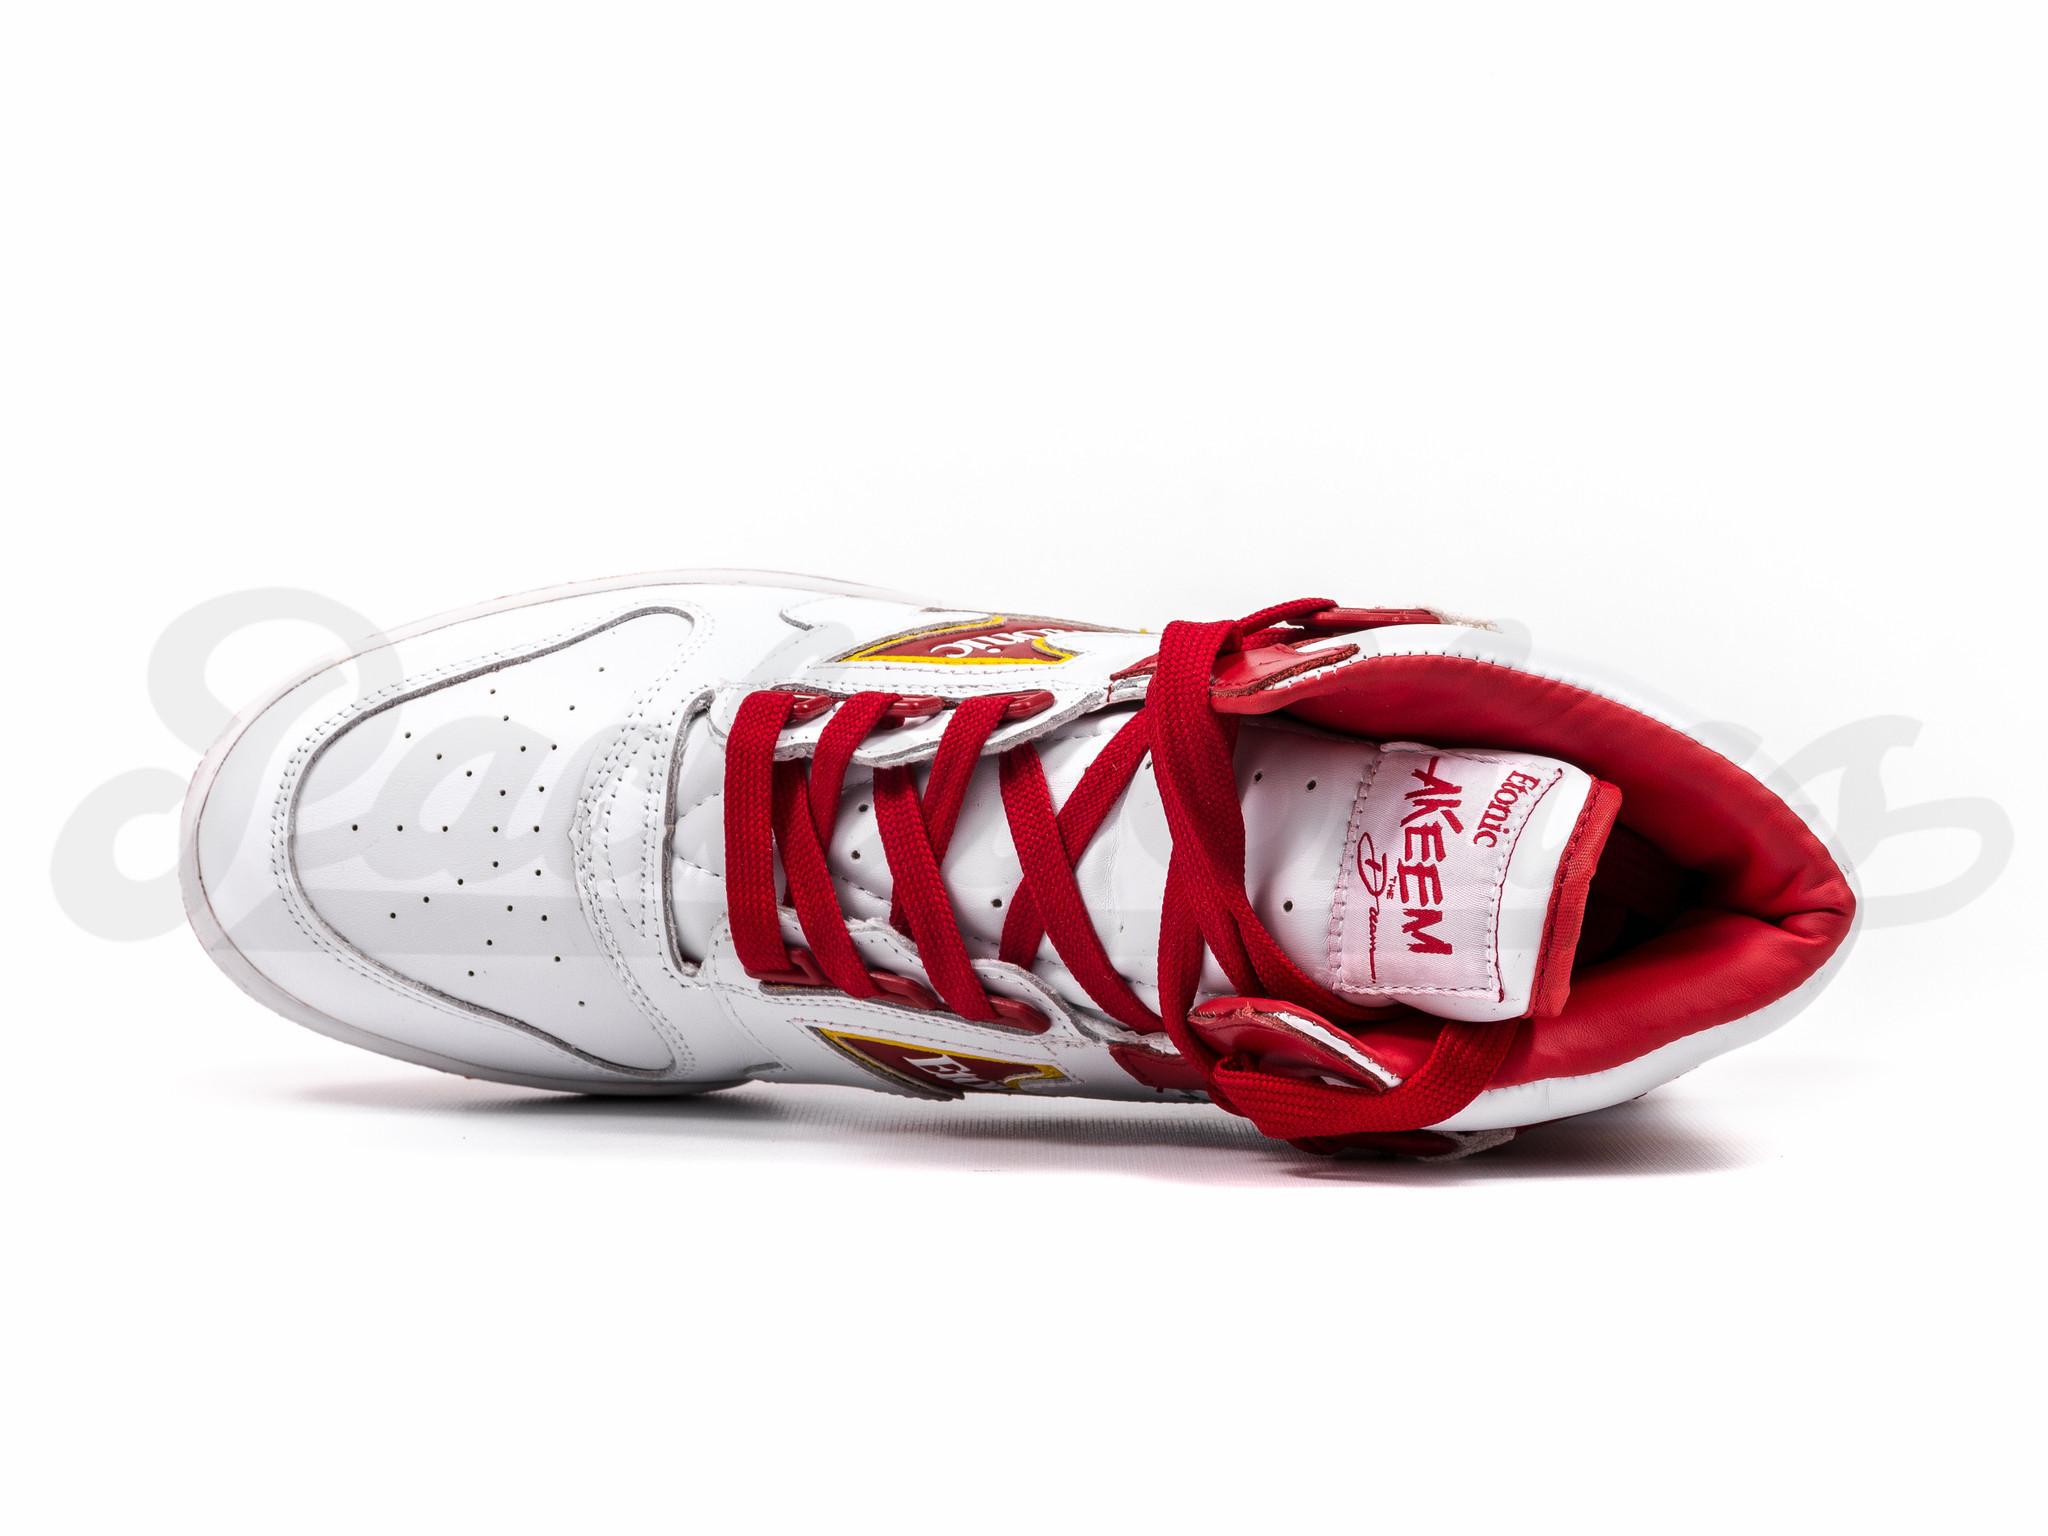 release-reminder-etonic-akeem-the-dream-white-red-5